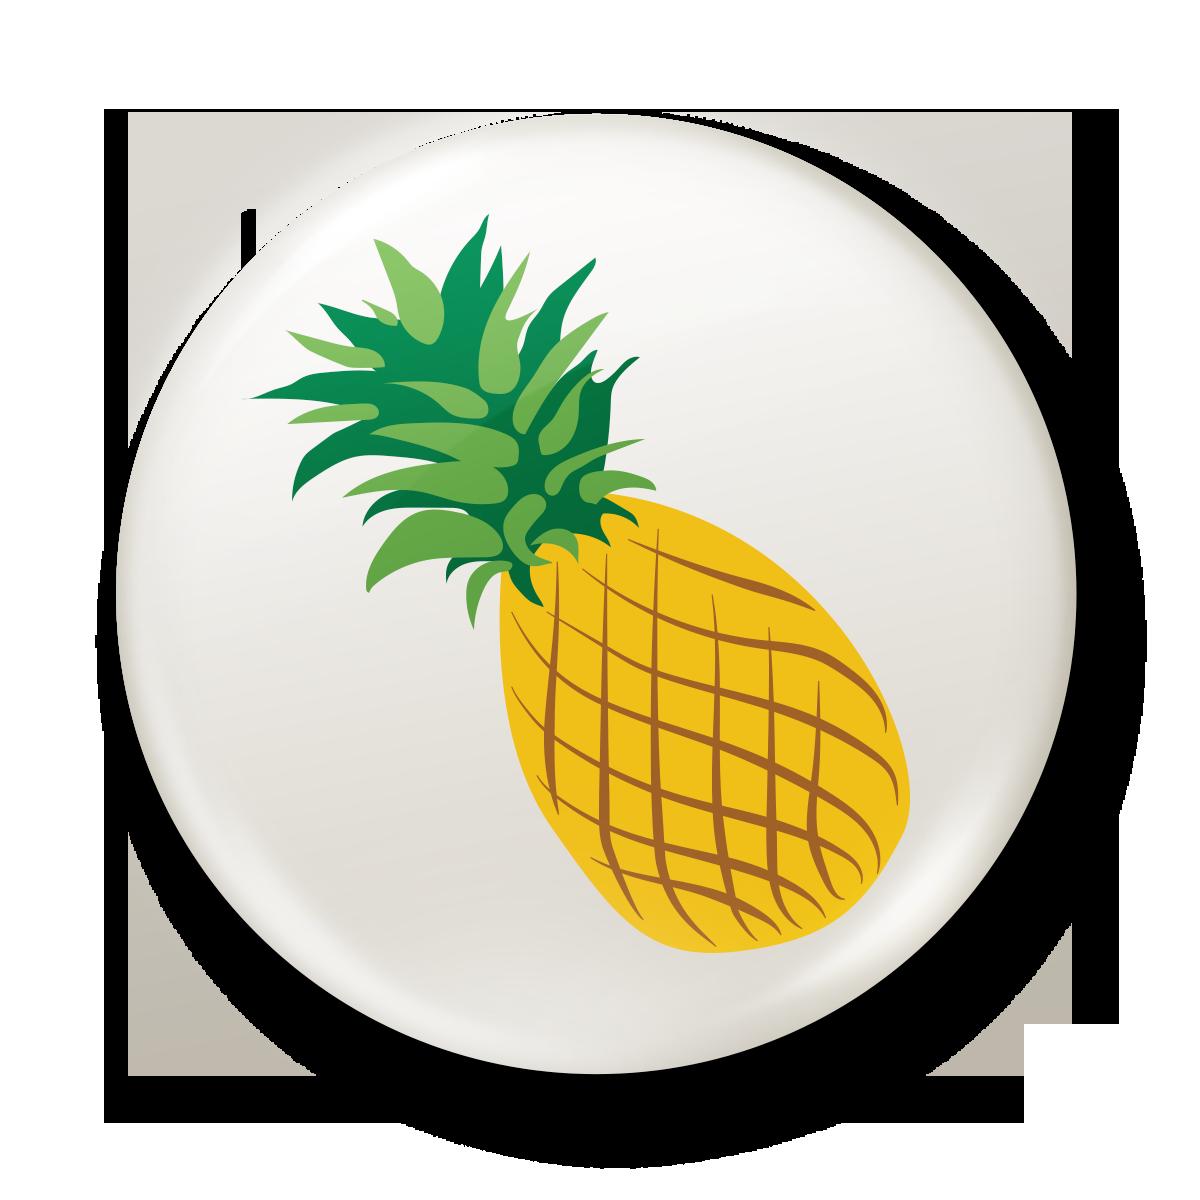 pineapple emoji png. pineapple emoji png e